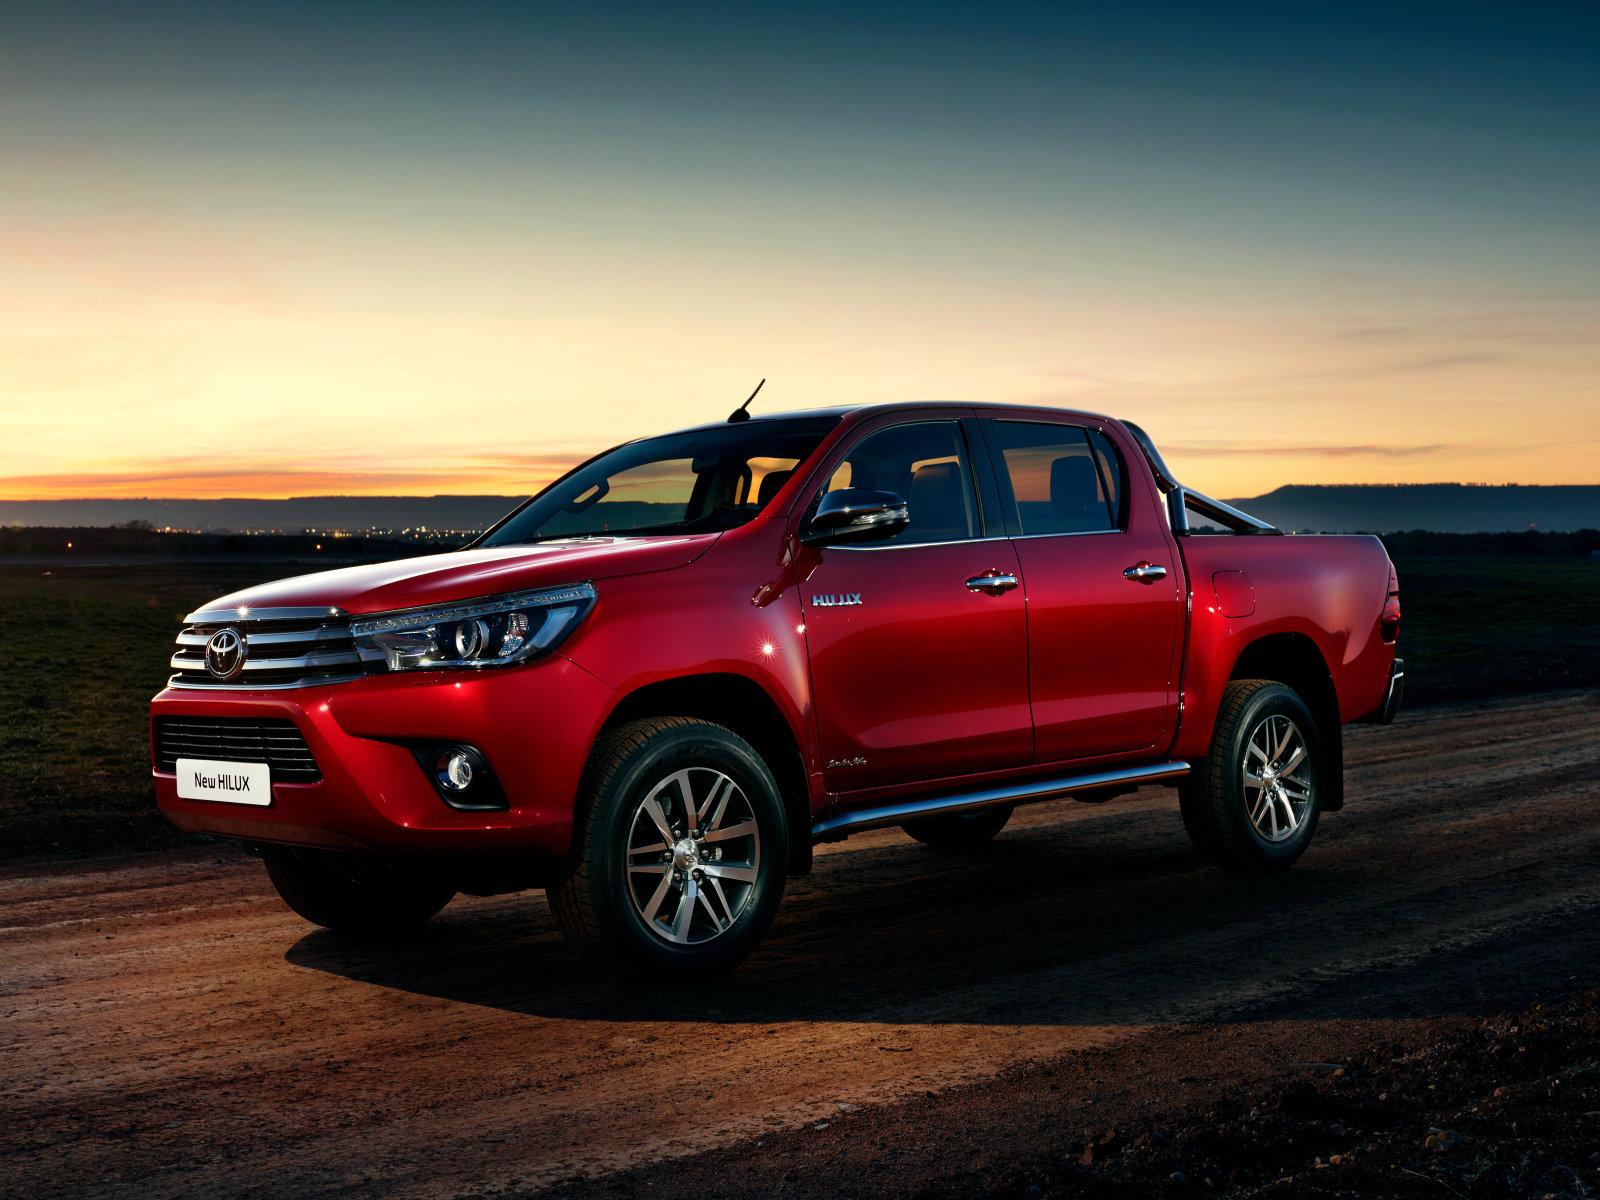 Toyota-HiLux Pickup 2017